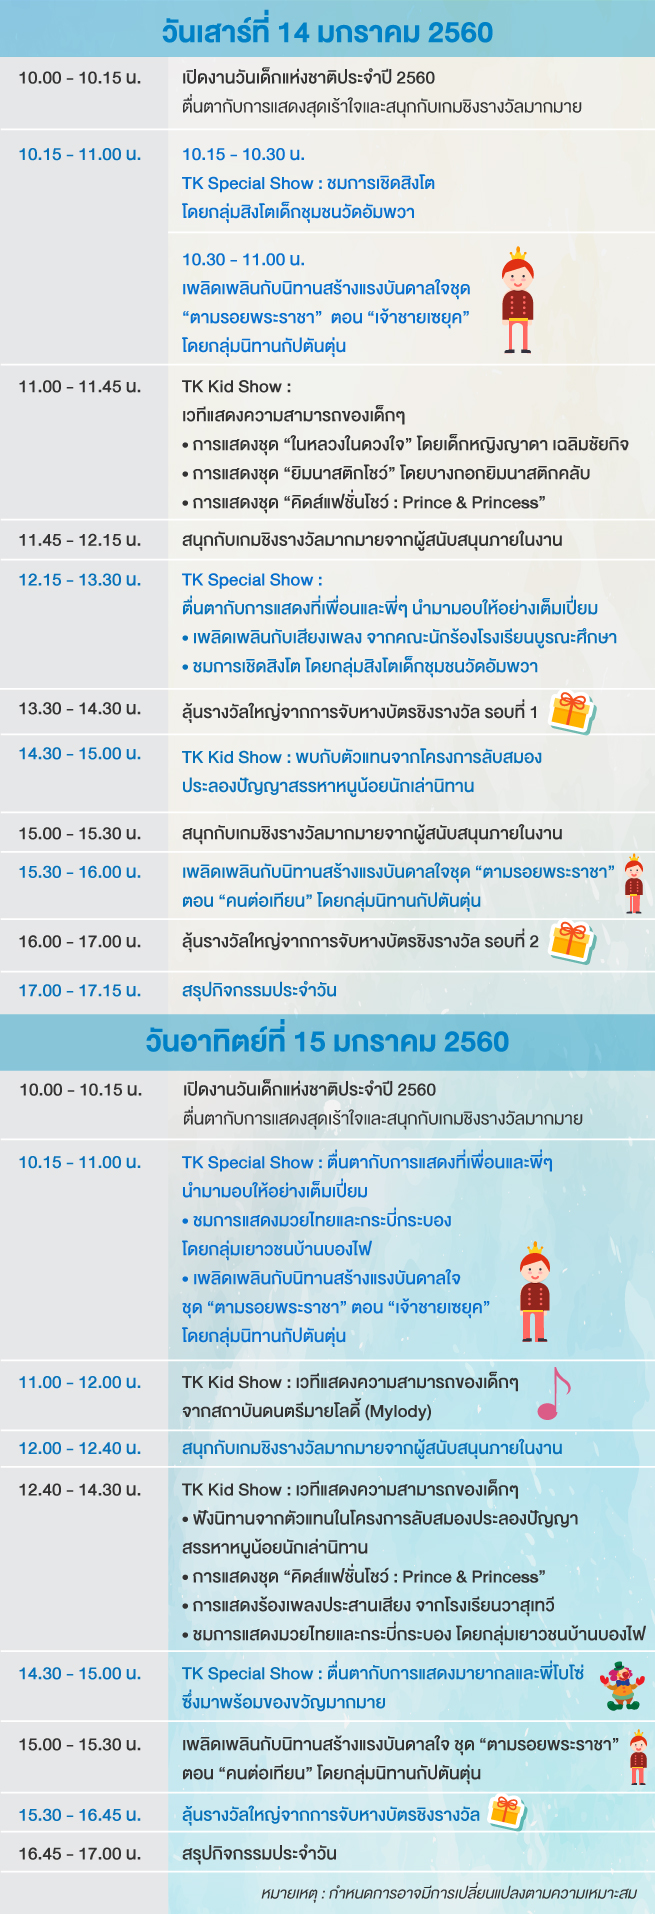 timetable_655x1914px.jpg